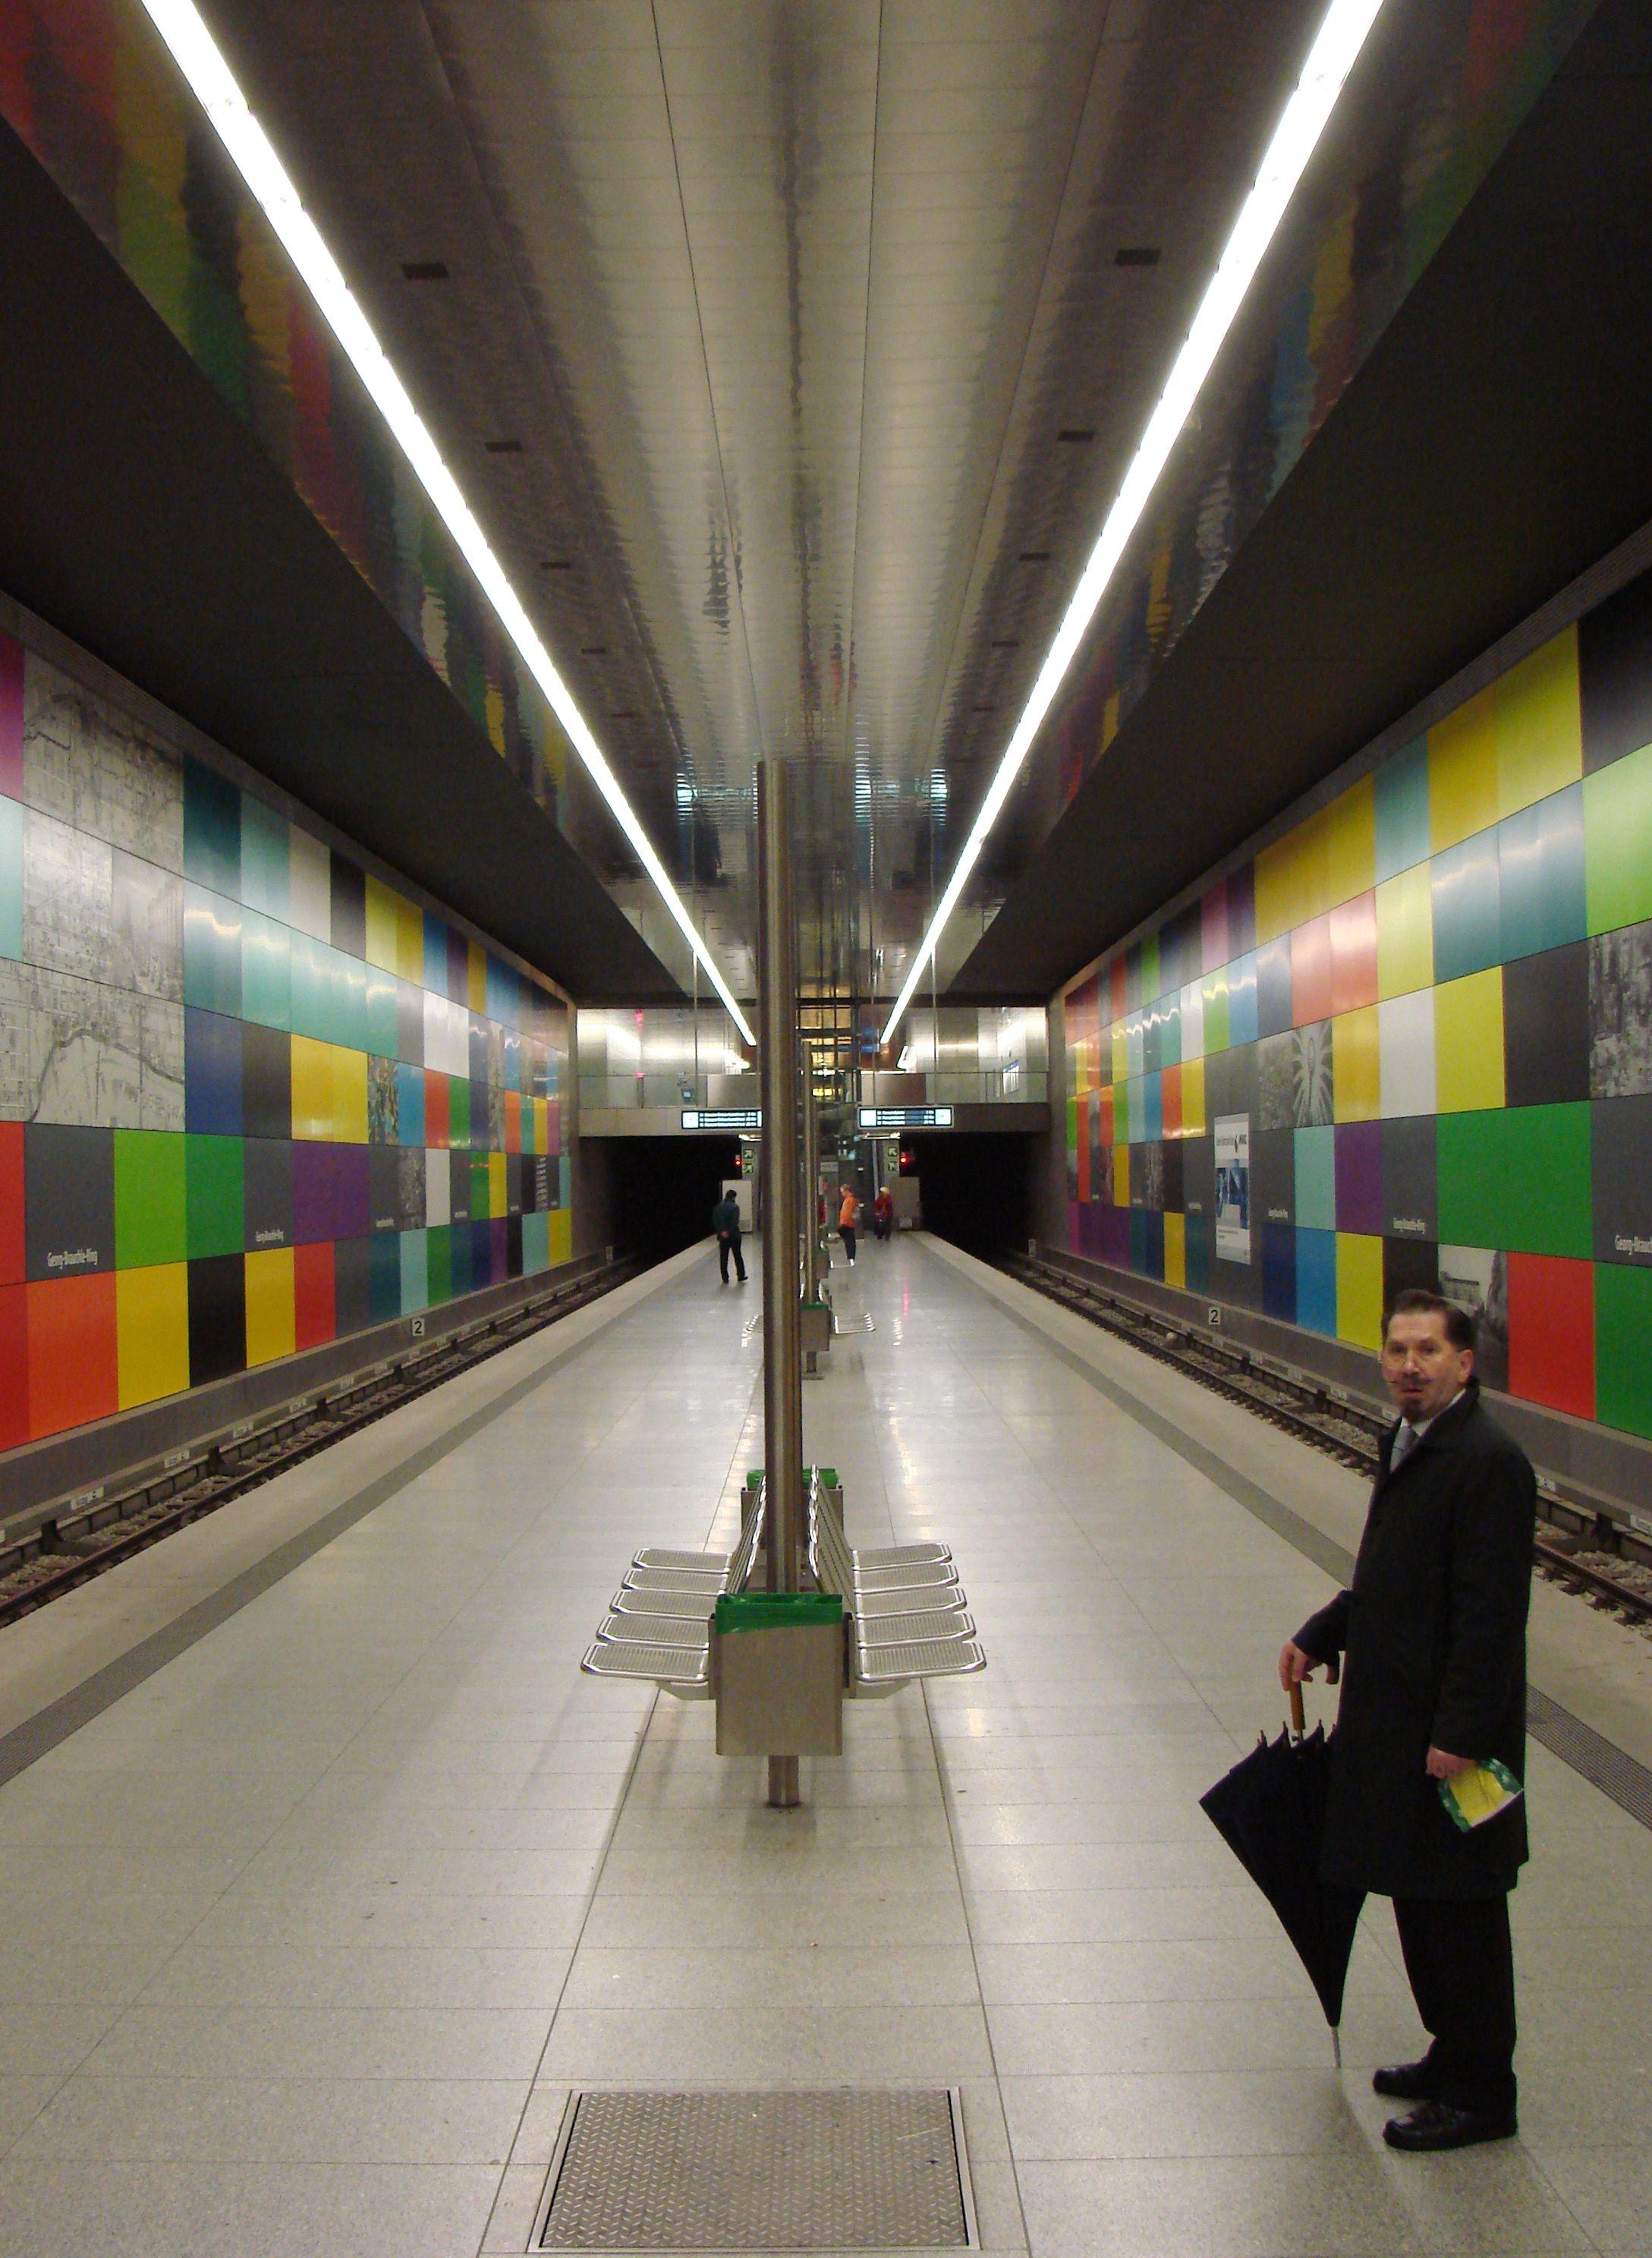 Pin By Panayiota Th On Subway Stations Interior Design Lighting Metro Station Subway Station